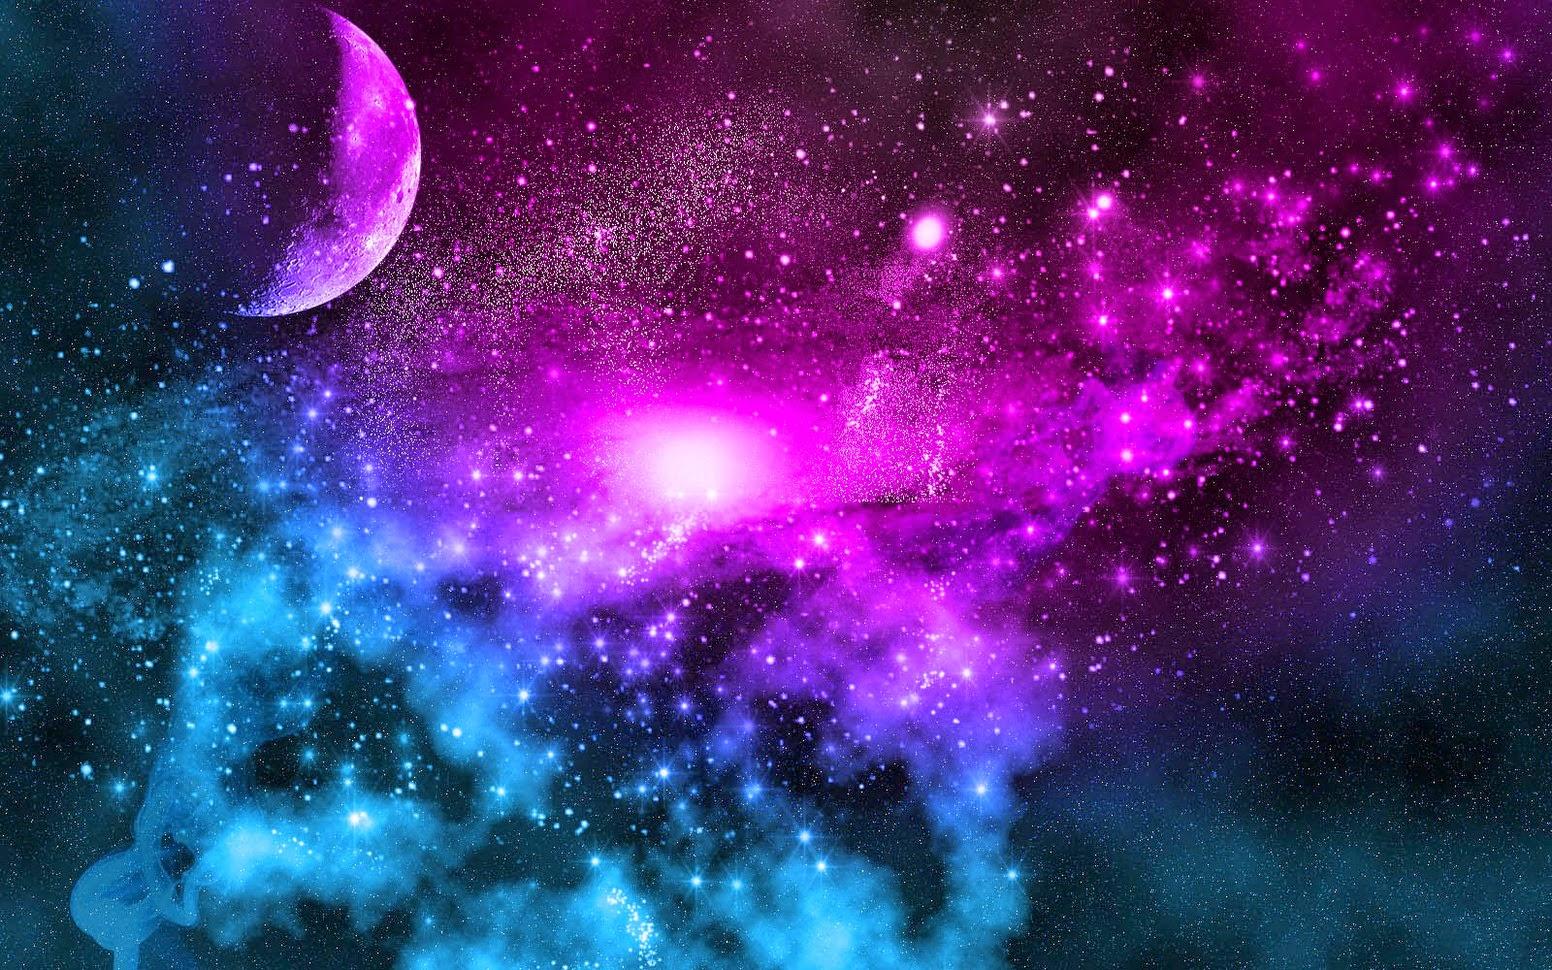 Galaxy Wallpaper Free Download: 2015-02-08